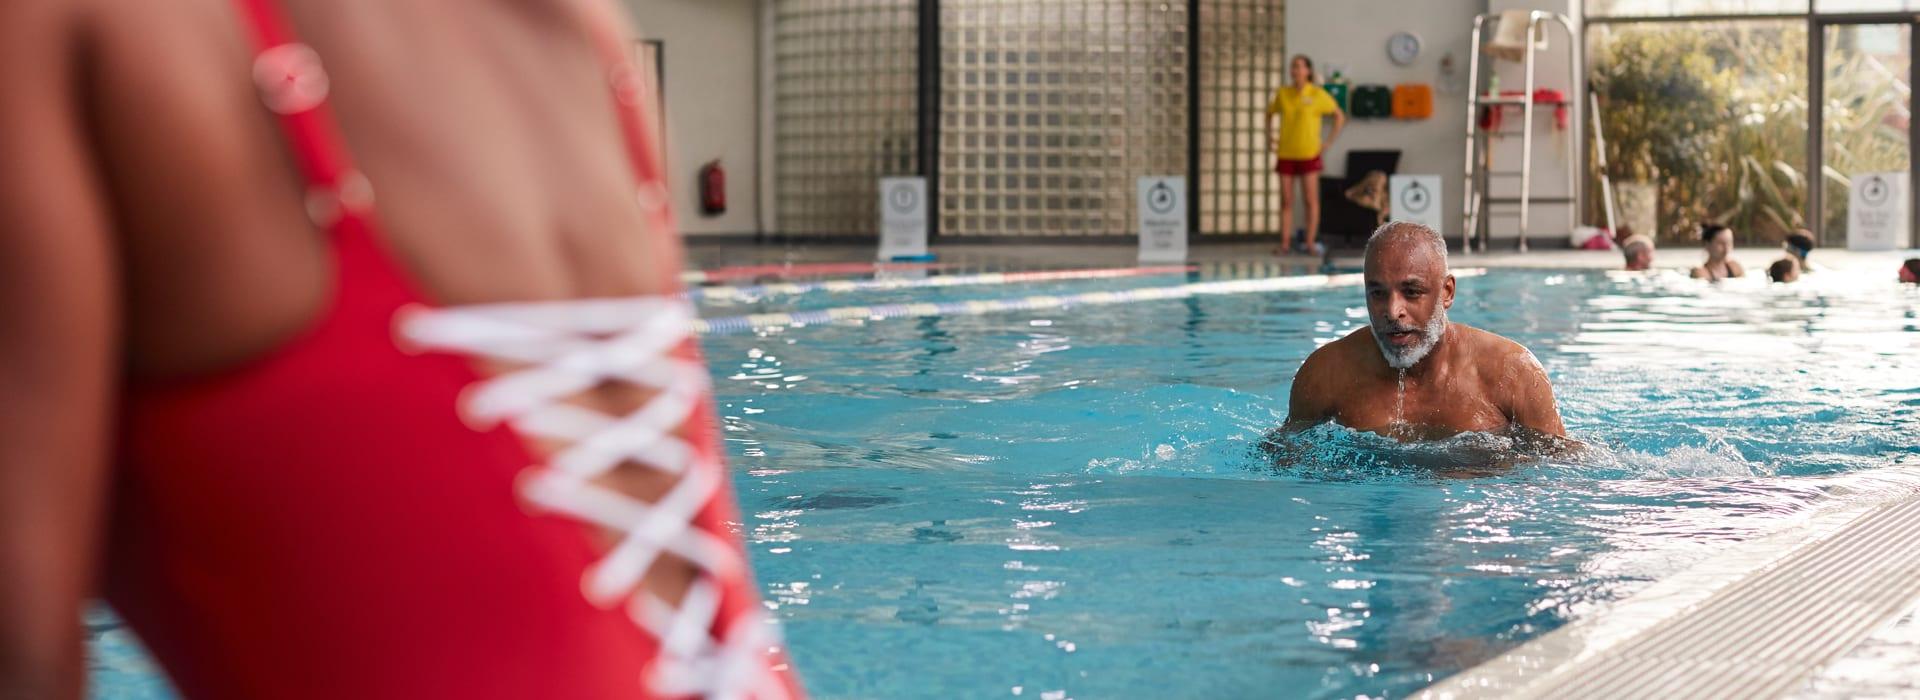 Enjoying a swim in the indoor pool